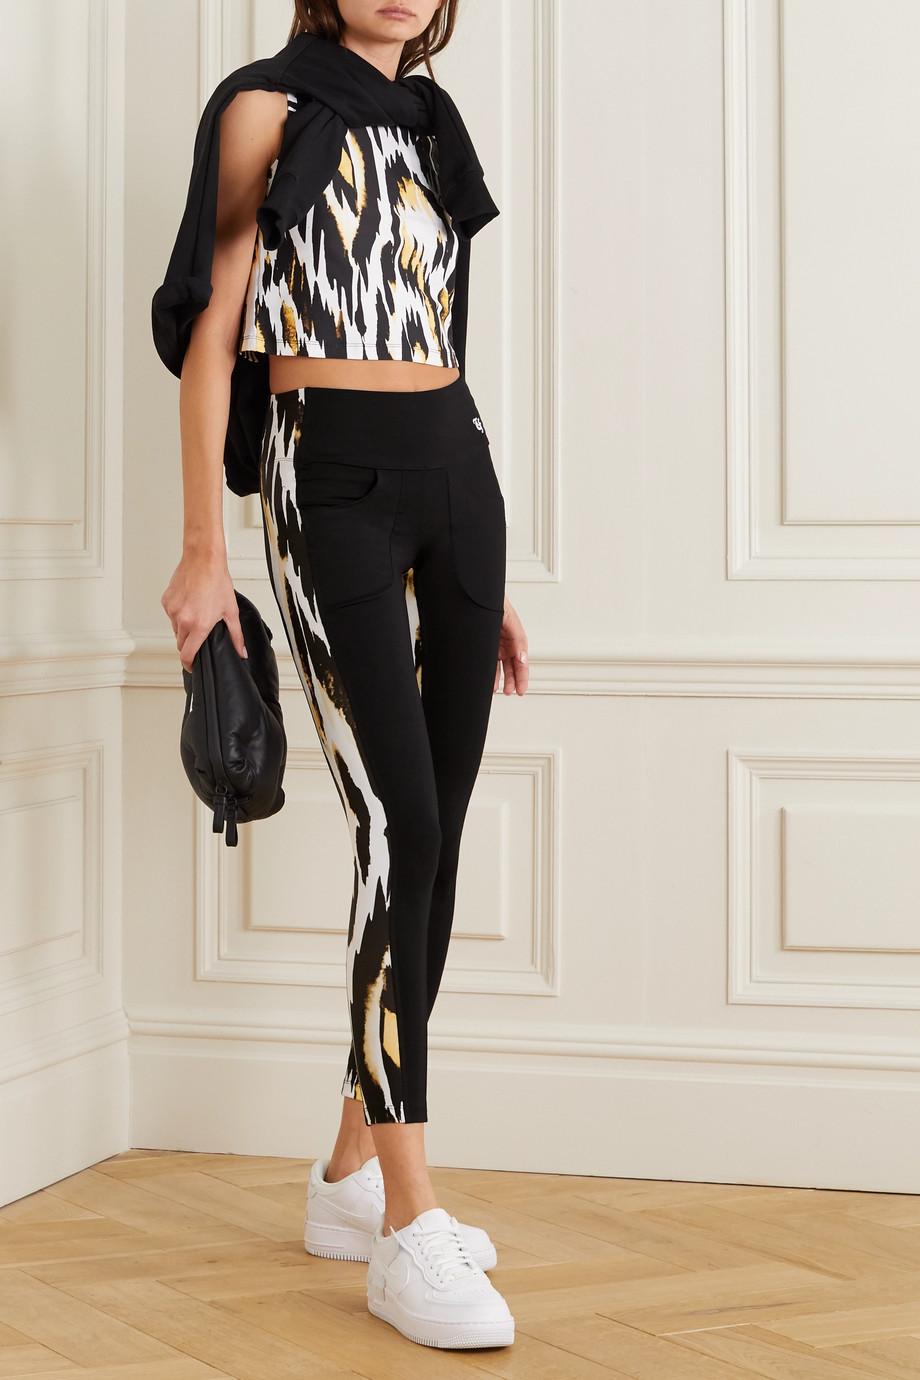 Twin Fantasy Paneled animal-print stretch leggings